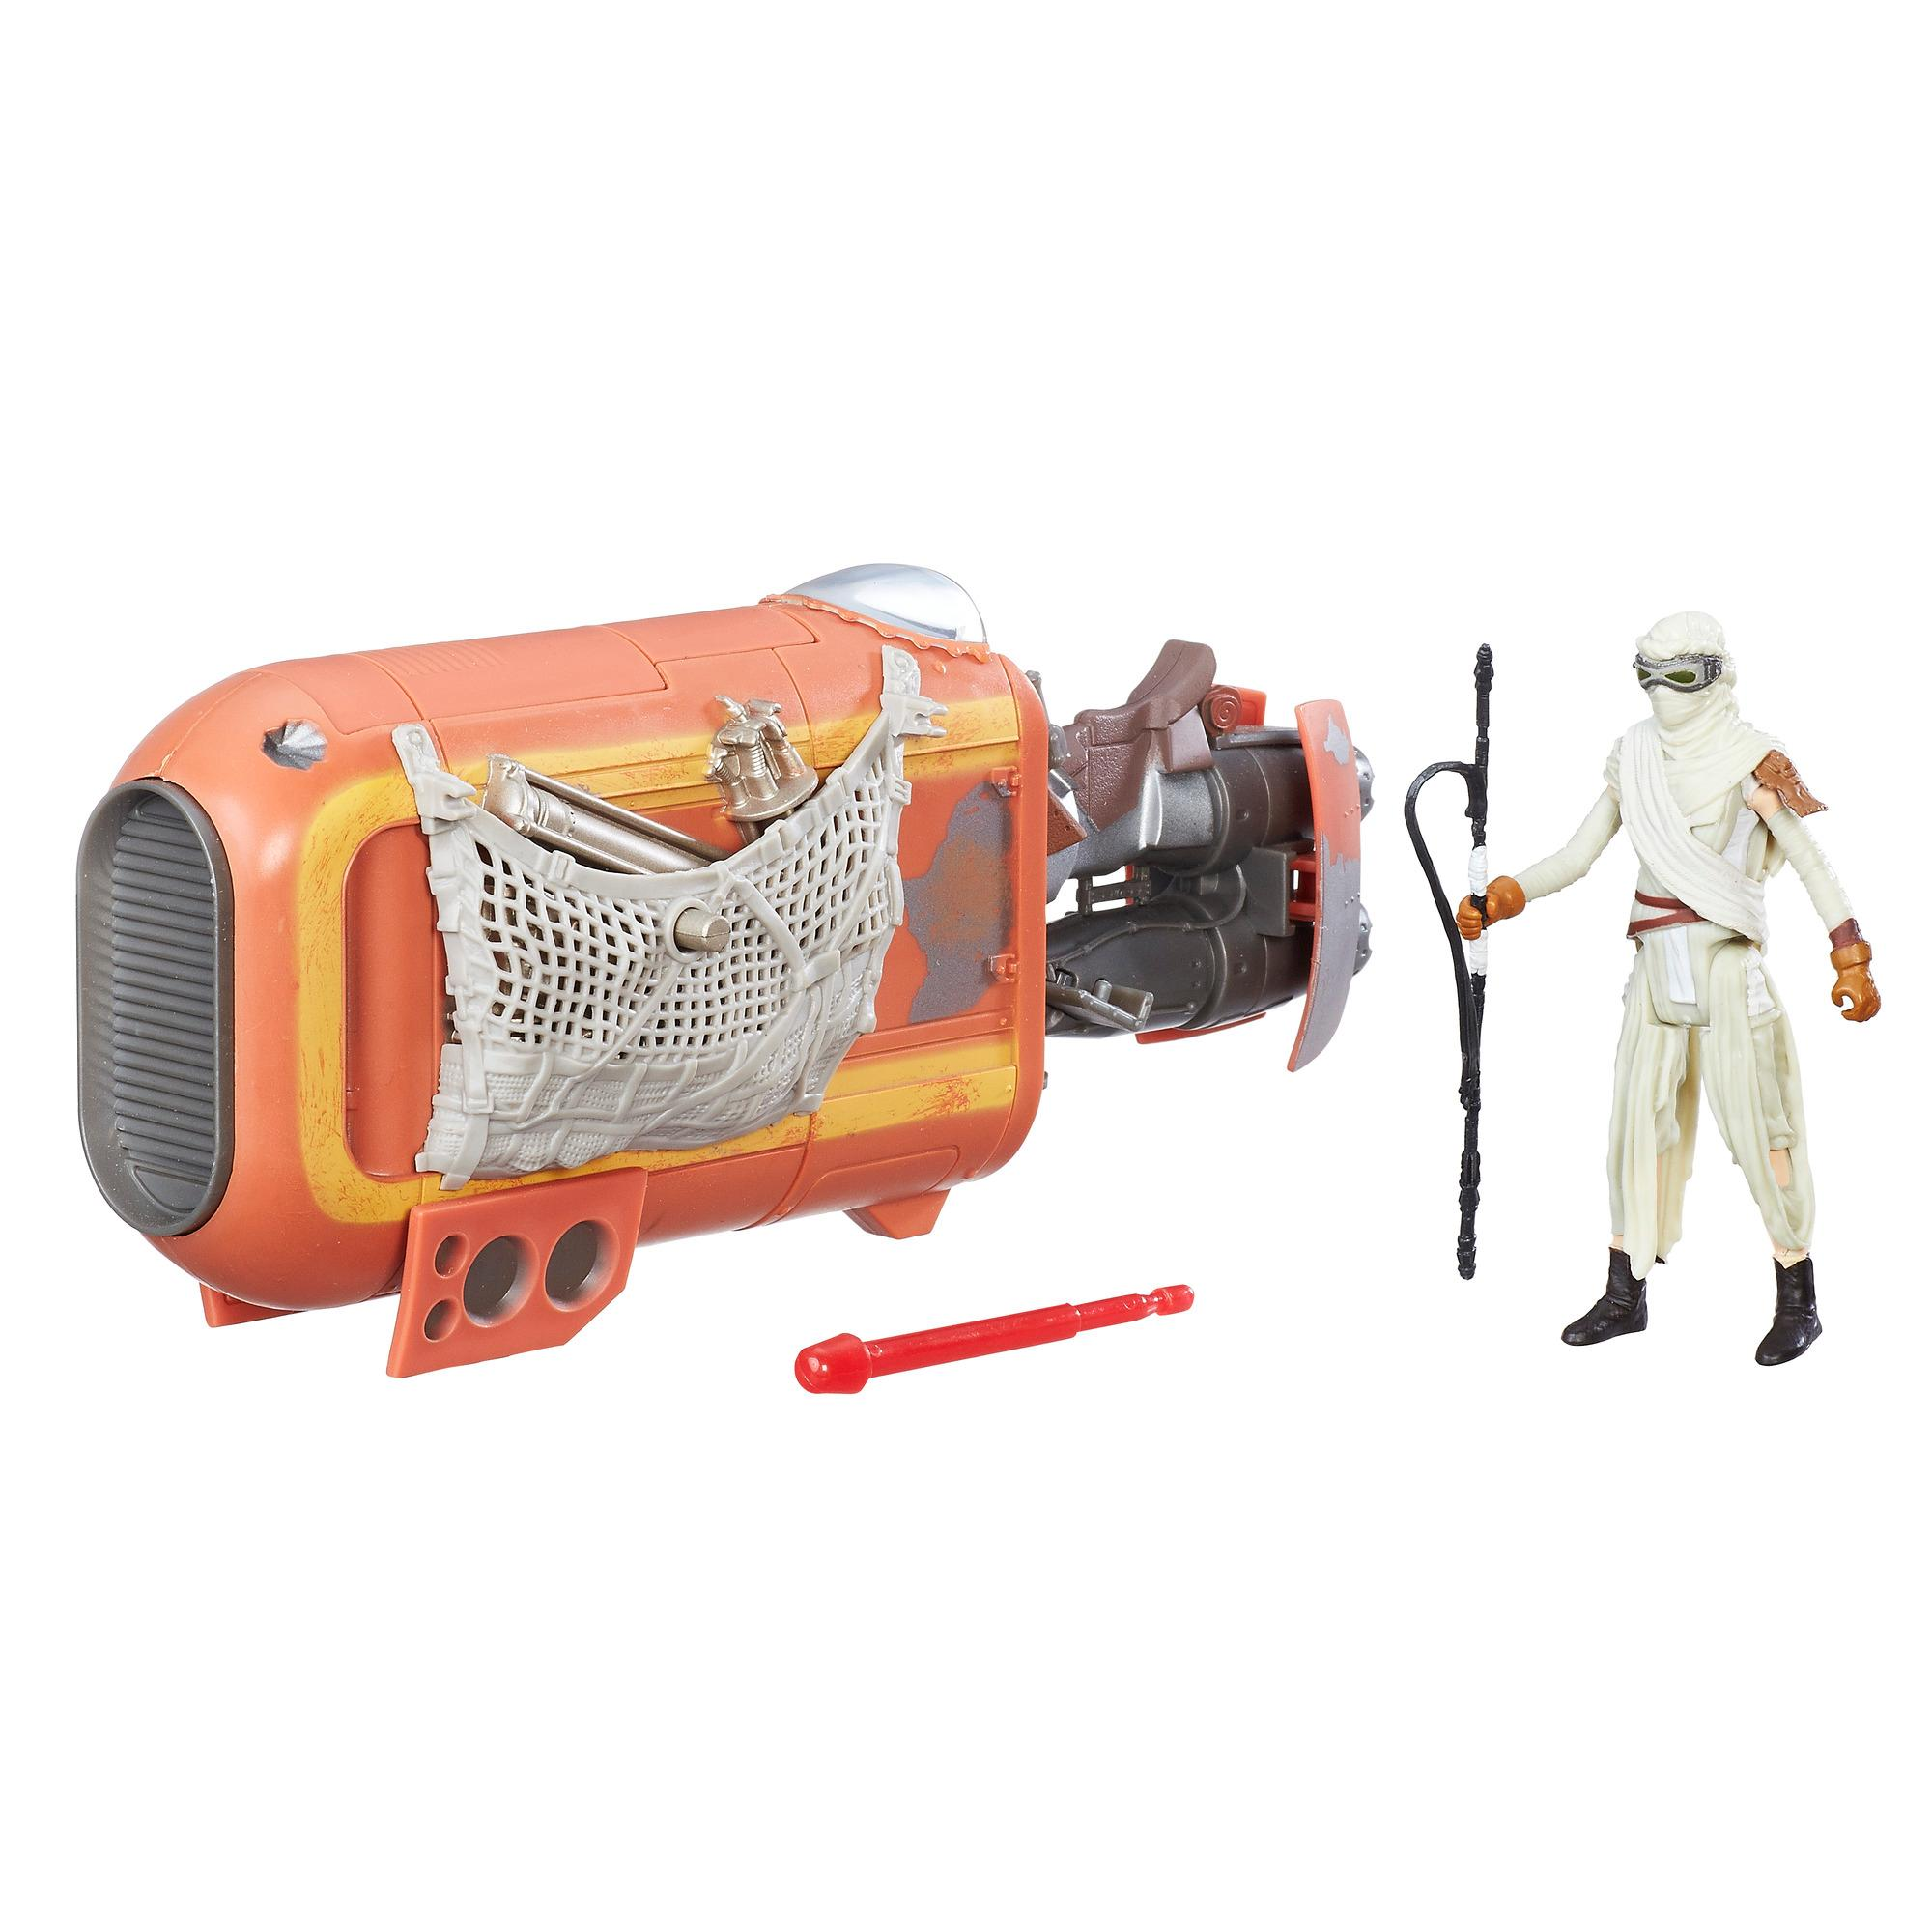 Star Wars: The Force Awakens Rey's Speeder (Jakku)